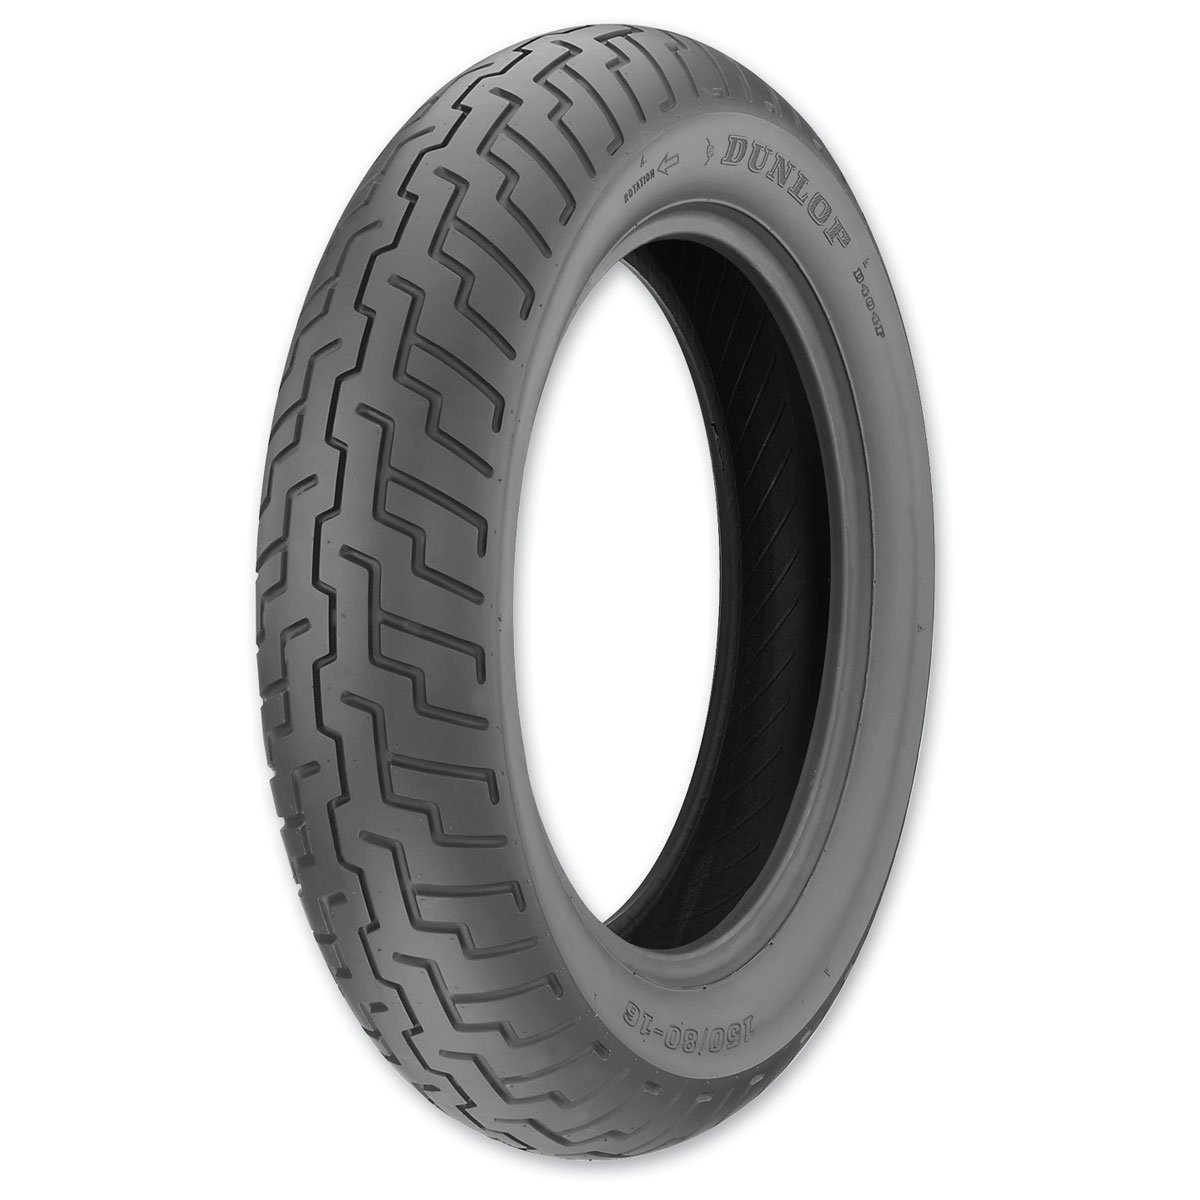 Dunlop D404 140/80-17 Front Tire 4016-87